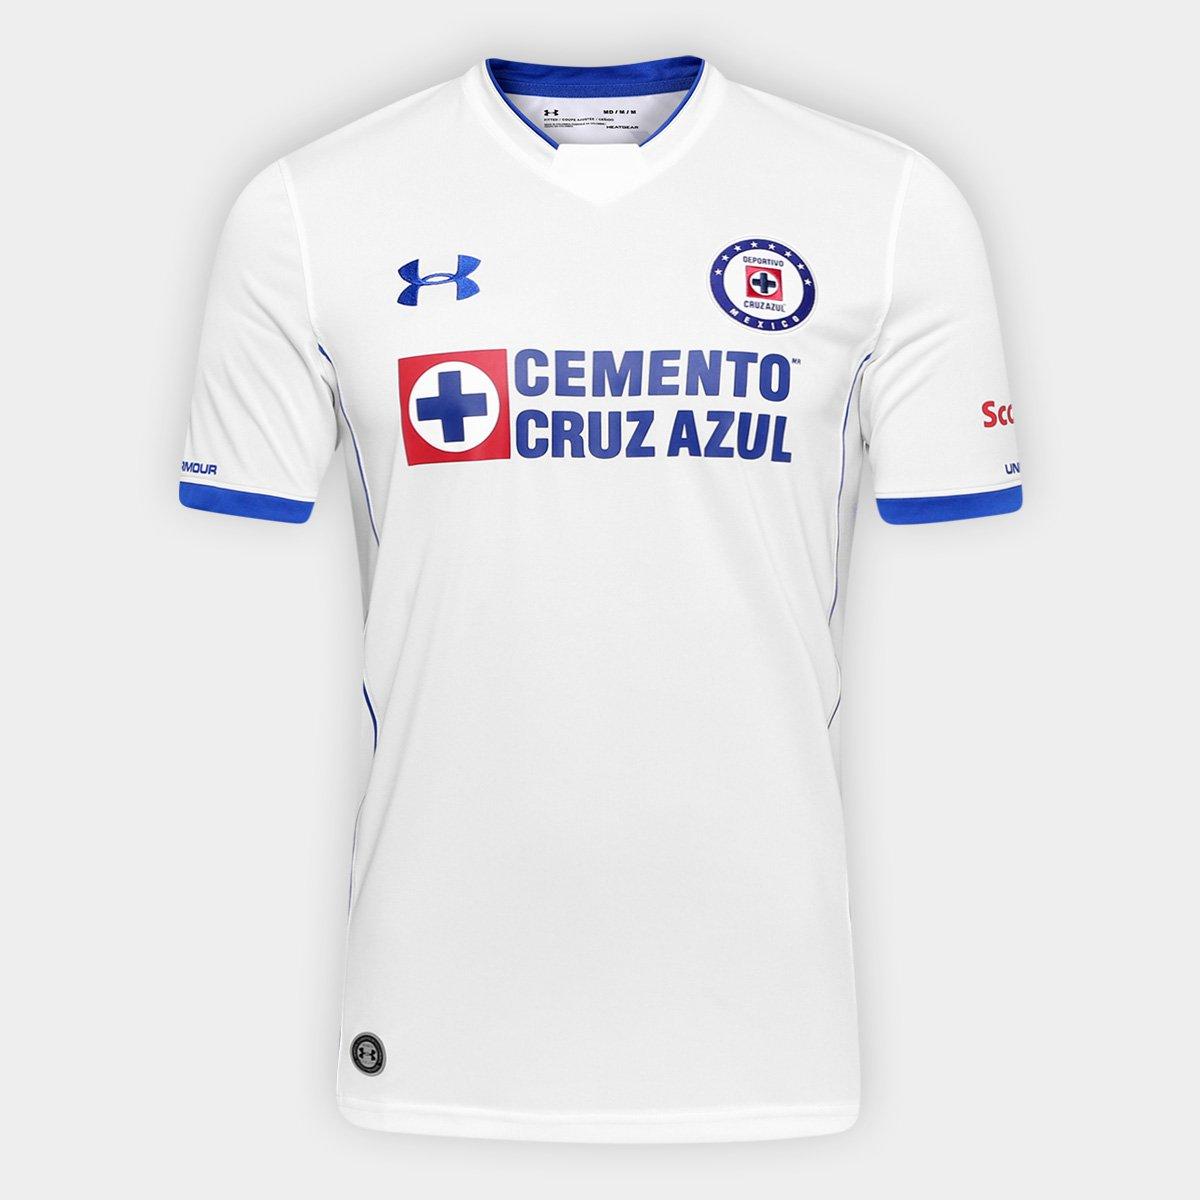 4f299e769 Camisa Cruz Azul Away 17/18 s/n° - Torcedor Under Armour Masculina |  Allianz Parque Shop